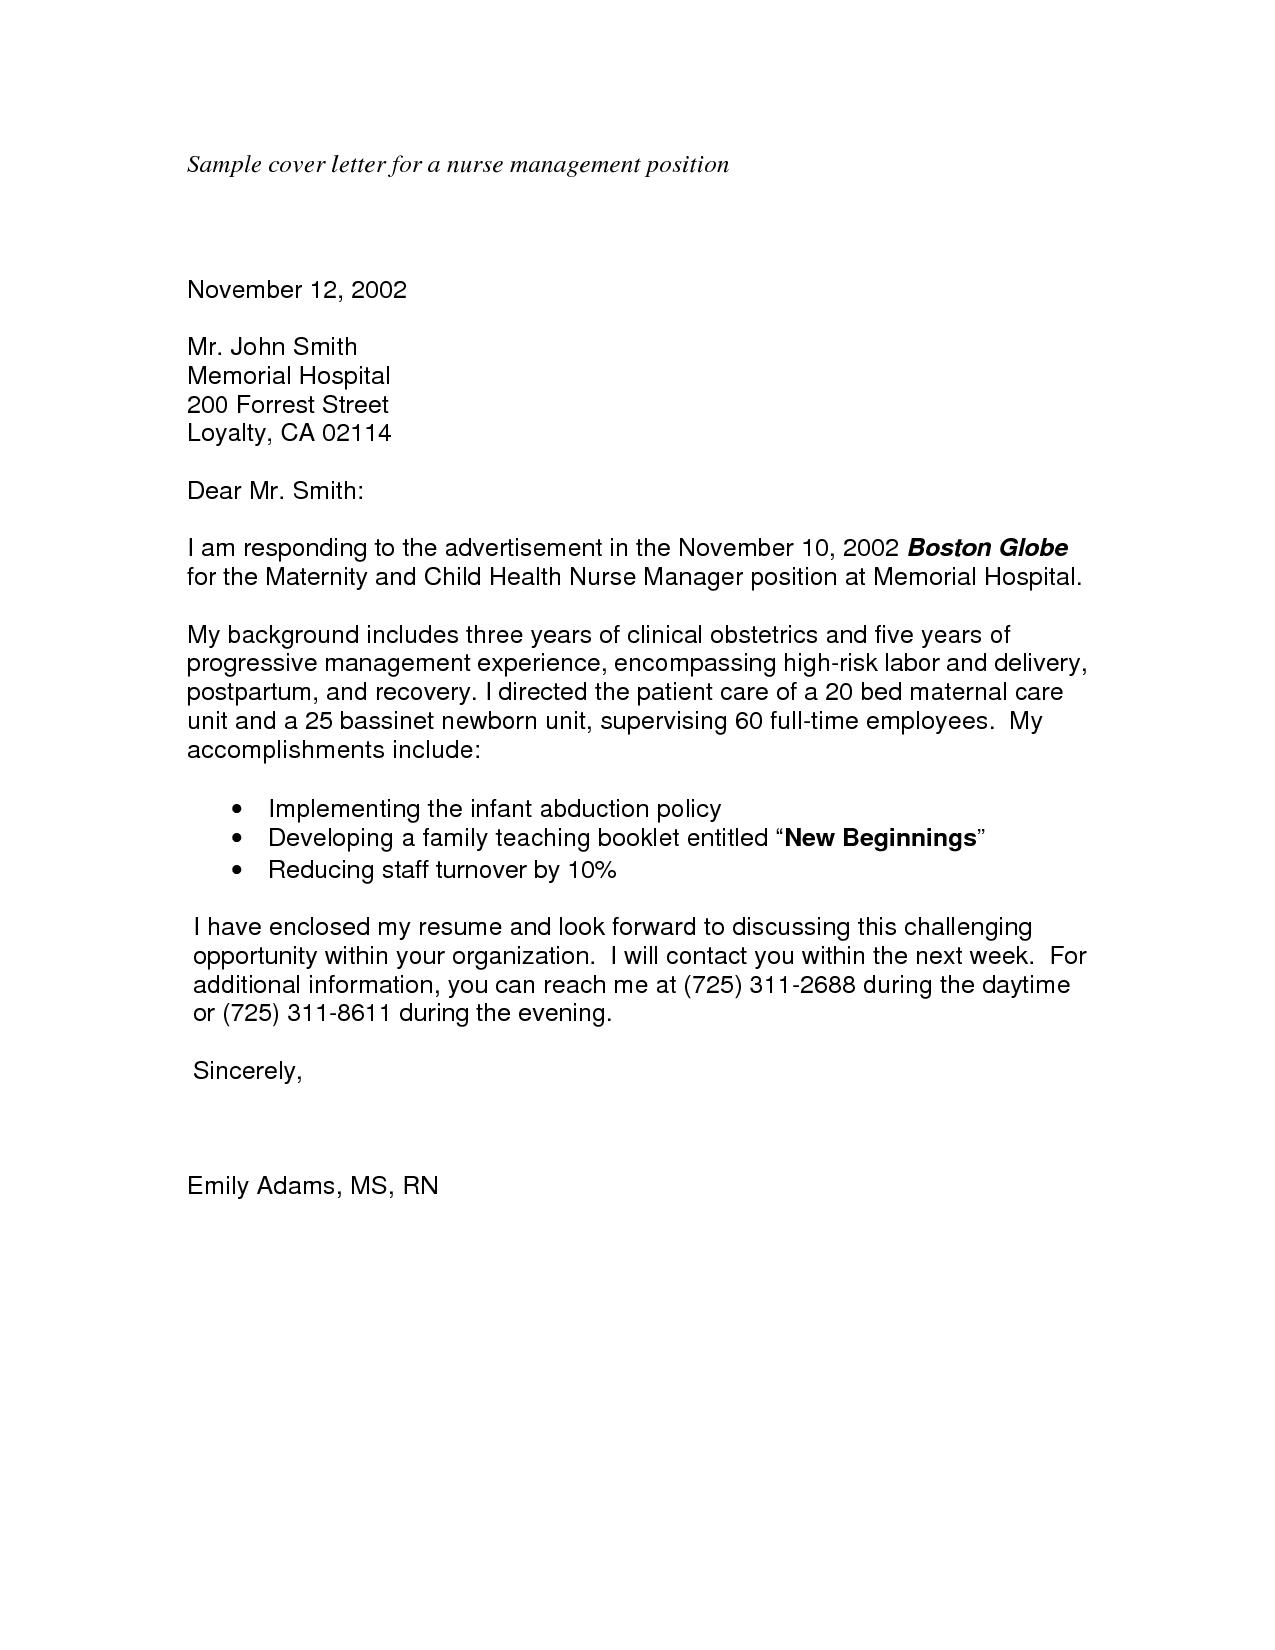 nephrology nurse job resume examples